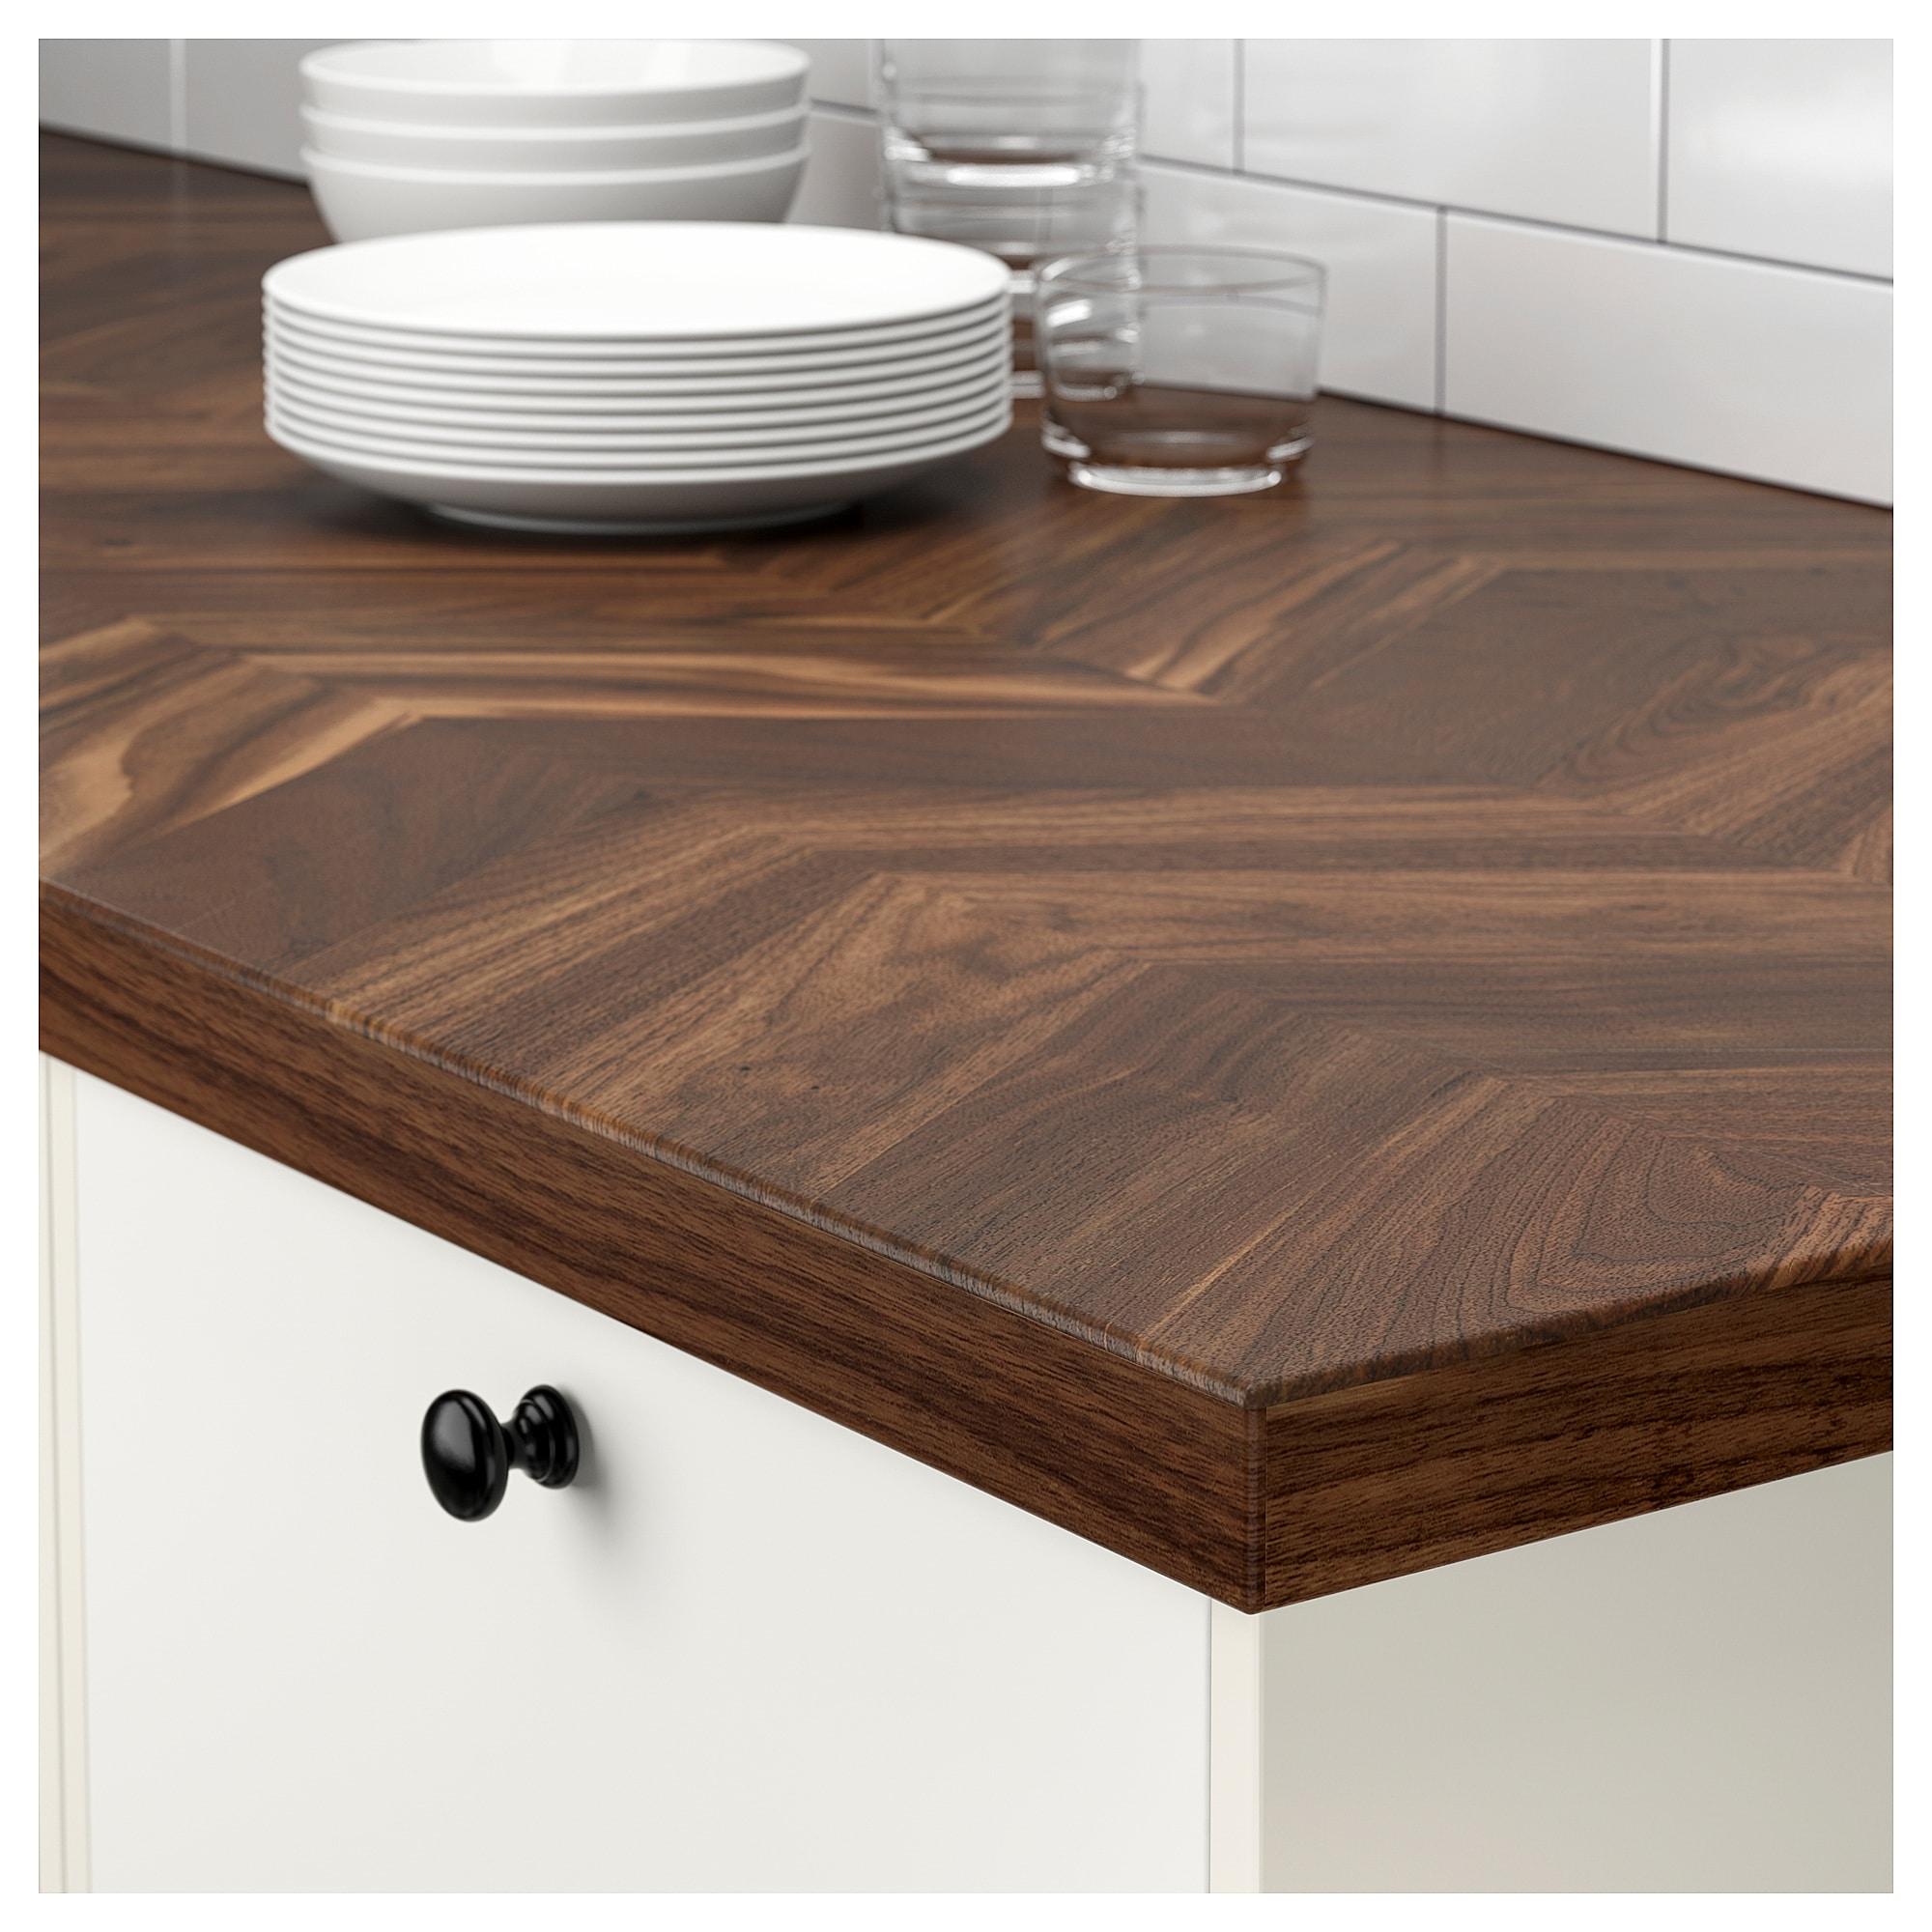 Barkaboda Countertop Walnut Veneer 98x1 1 2 249x3 8 Cm Kitchen Countertops Countertops Wood Kitchen Counters